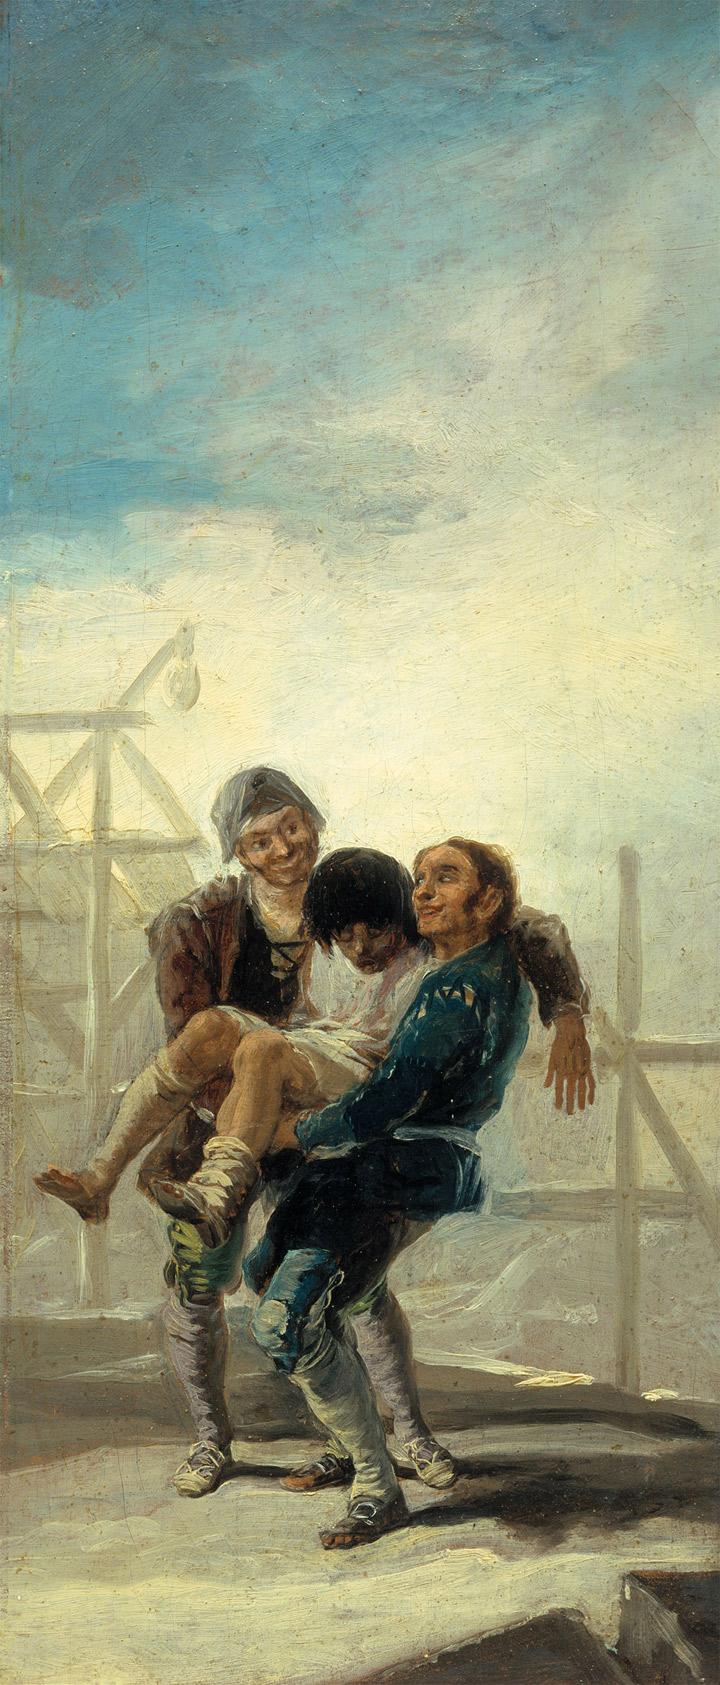 <p>Francisco de Goya,&nbsp;<em>El alba&ntilde;il borracho,</em>&nbsp;boceto, 1786-87, Legado Fern&aacute;ndez Dur&aacute;n, Madrid, Museo del Prado</p>